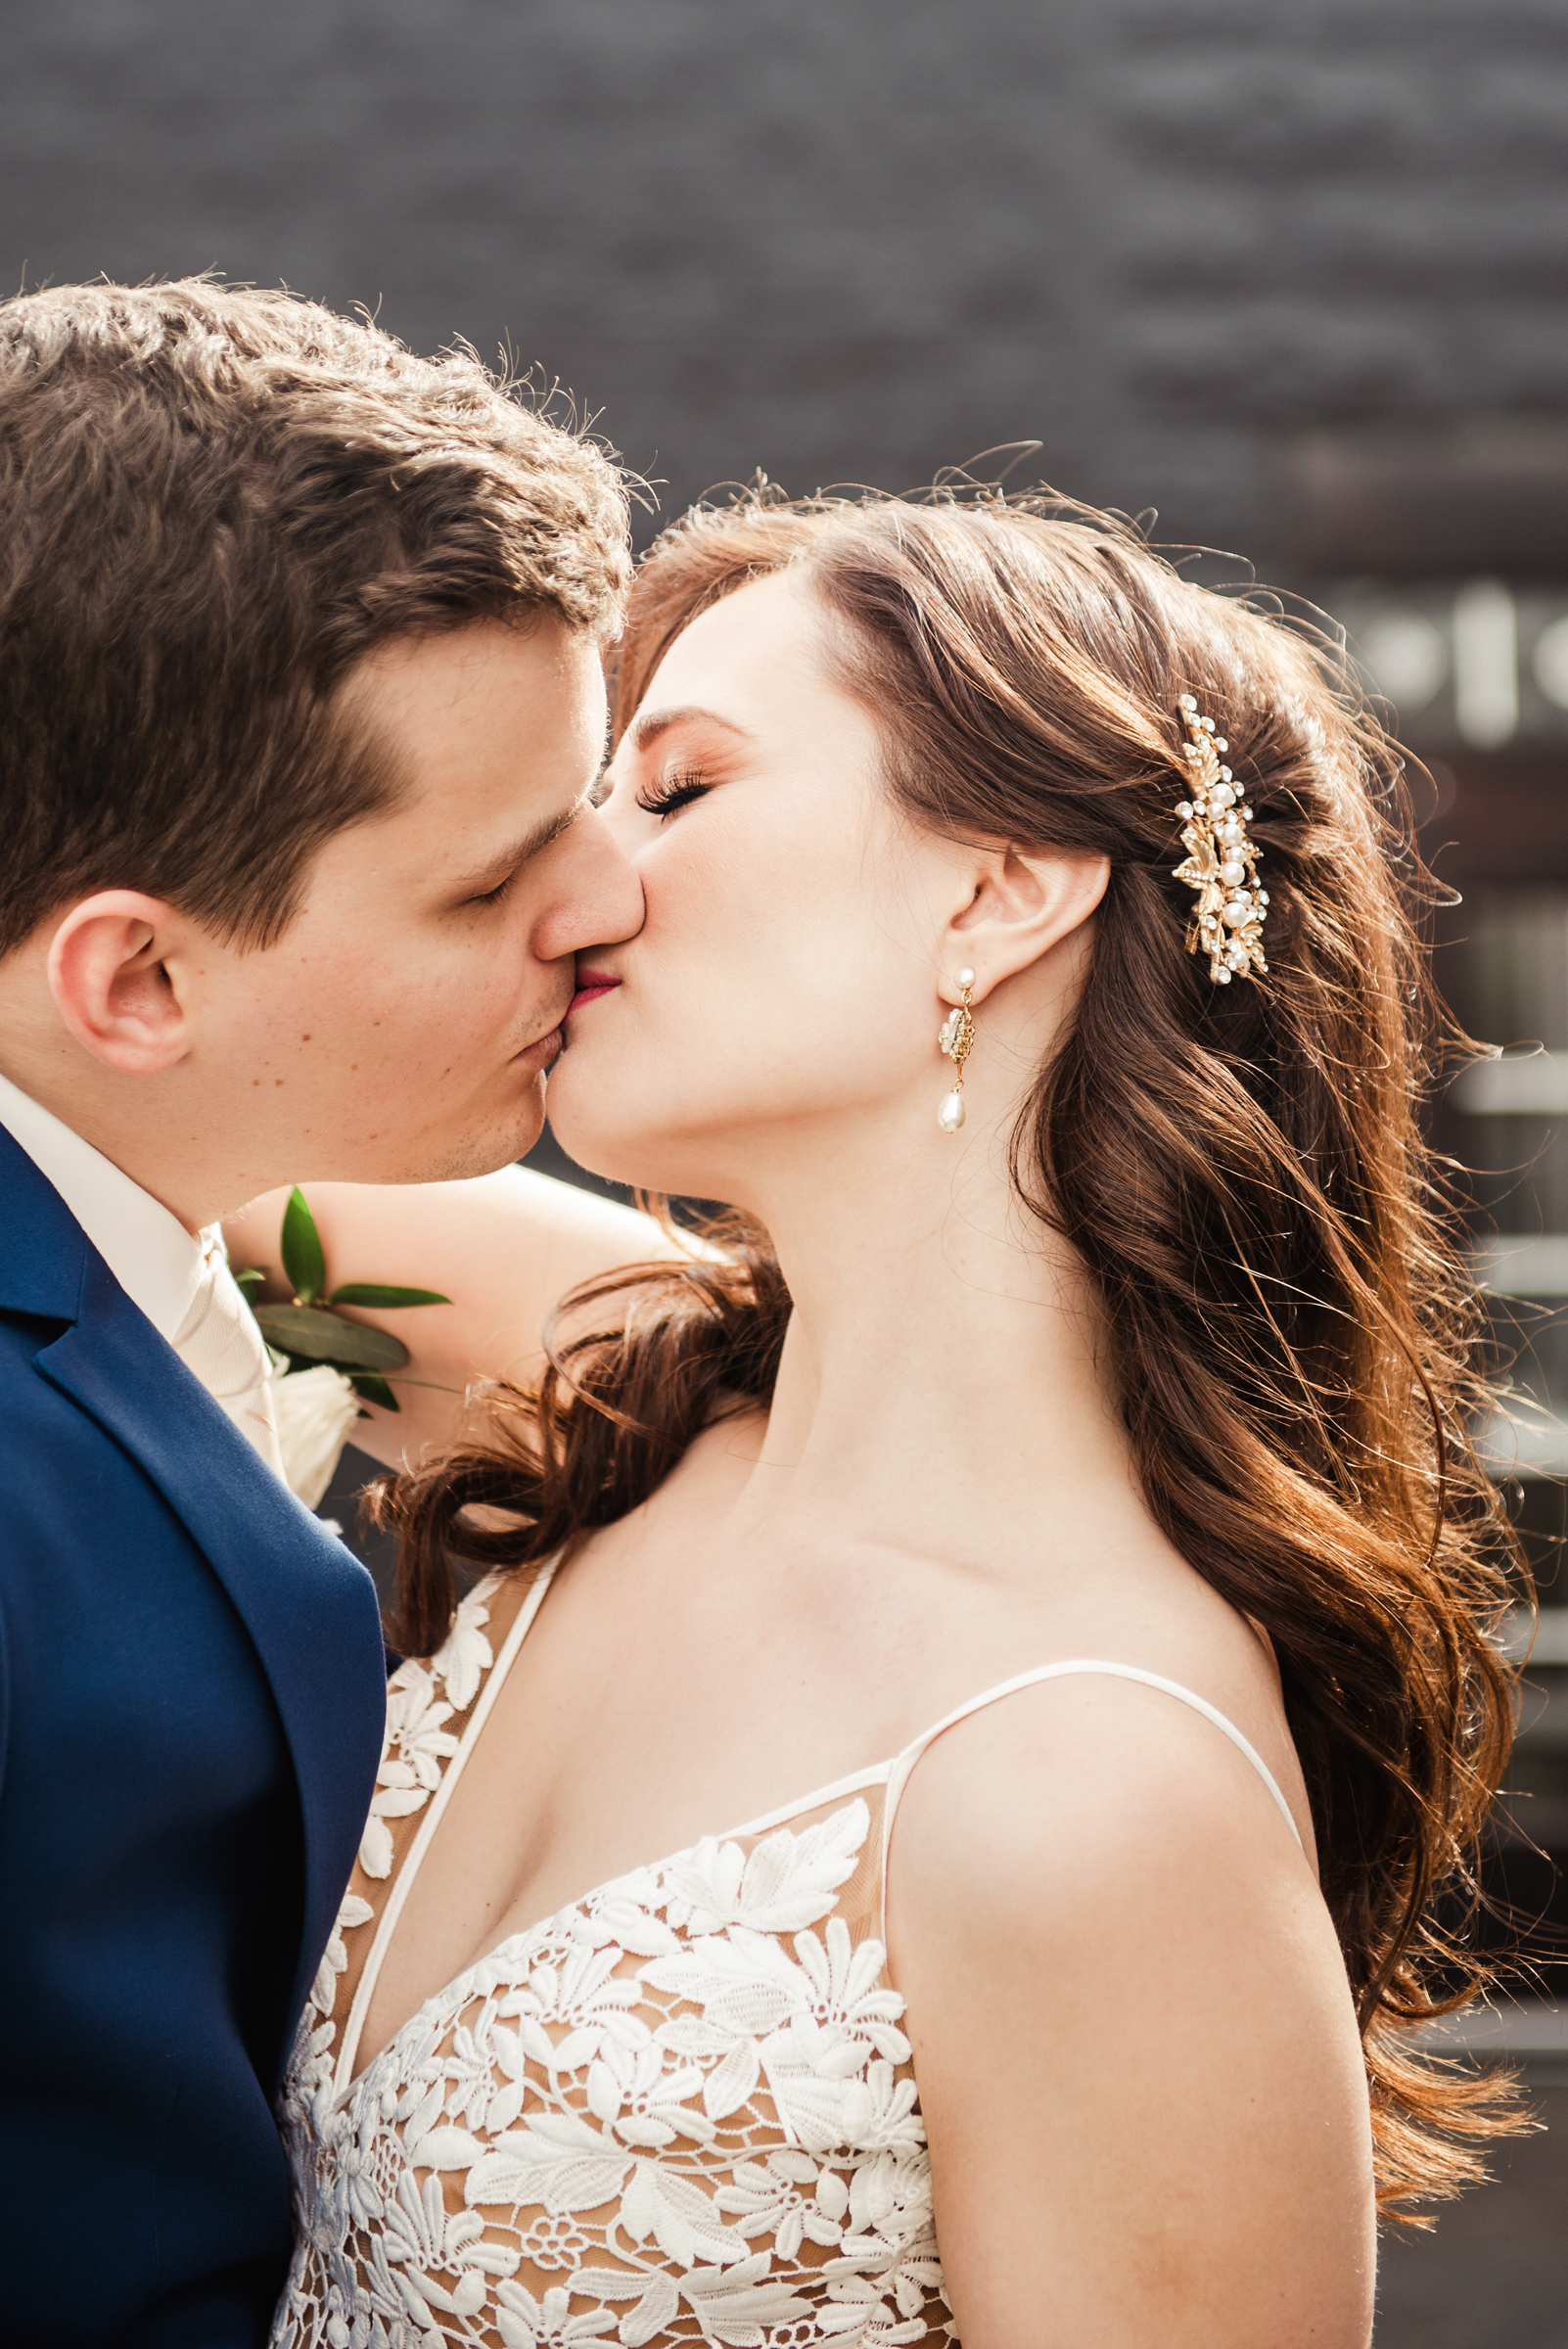 The_Arbor_LoftRochester_Wedding_JILL_STUDIO_Rochester_NY_Photographer_160537.jpg